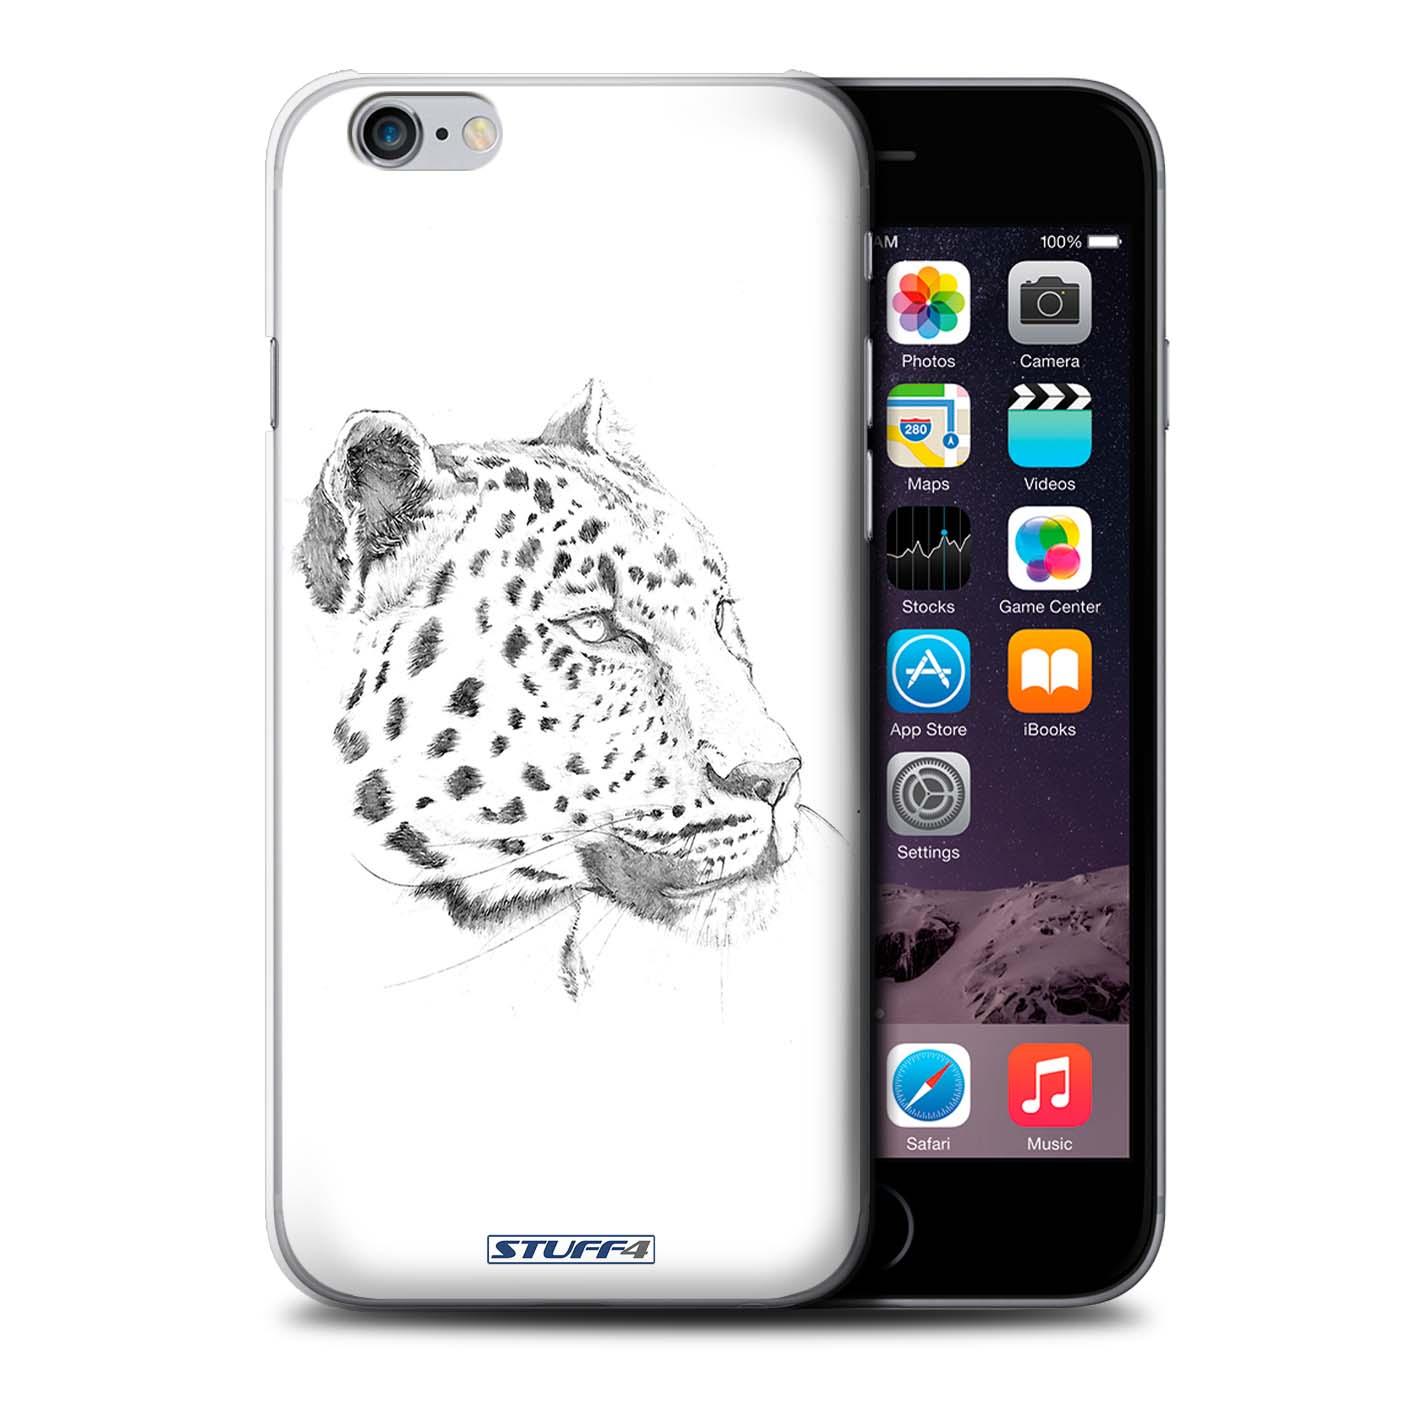 1417x1417 Stuff4 Back Casecoverskin For Apple Iphone 6s plussketch